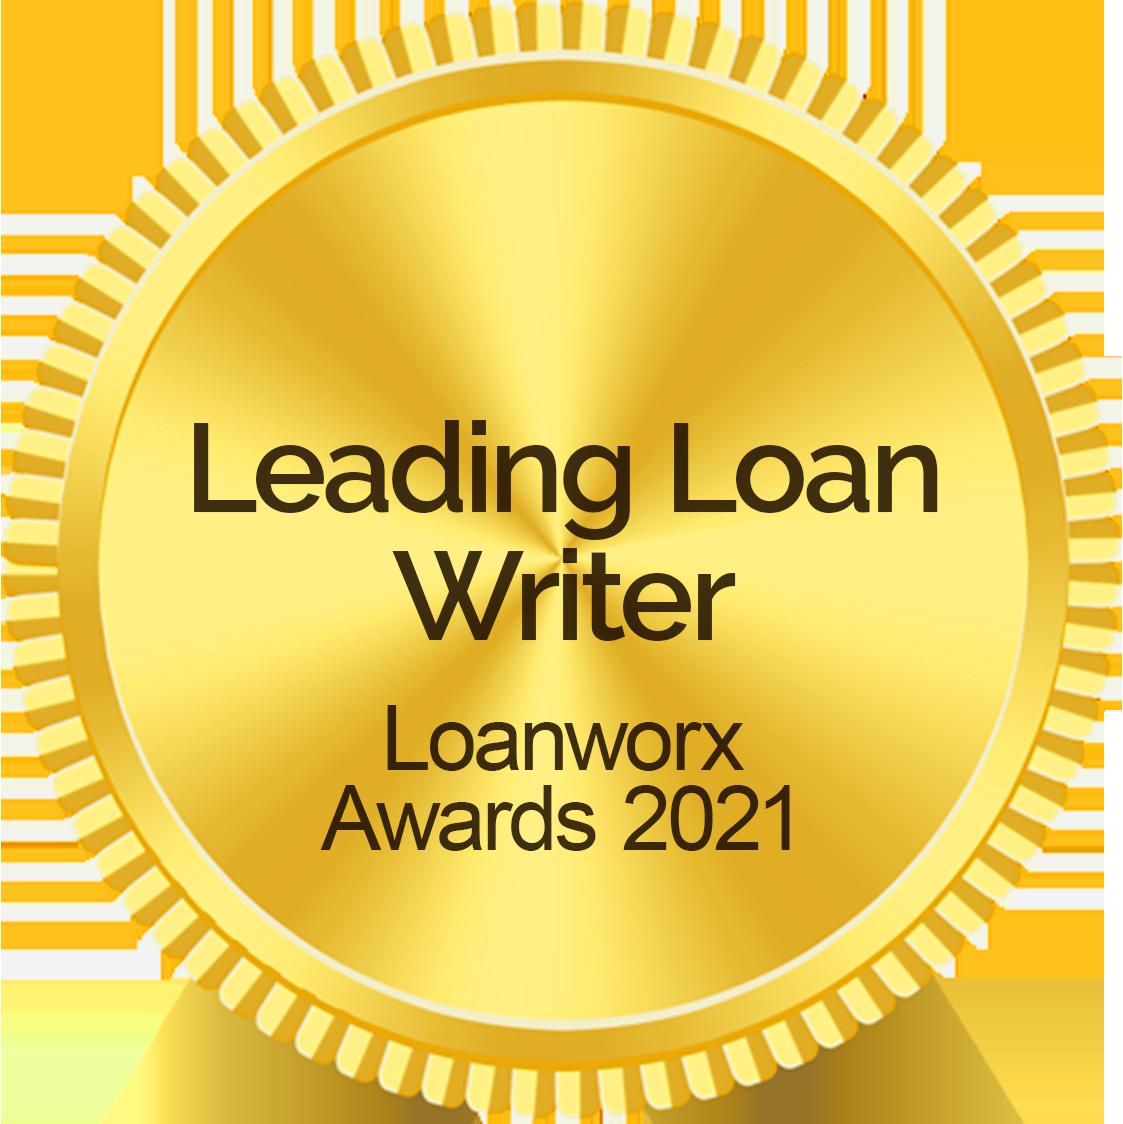 Leading Loan Writer - Loanworx Awards 2021